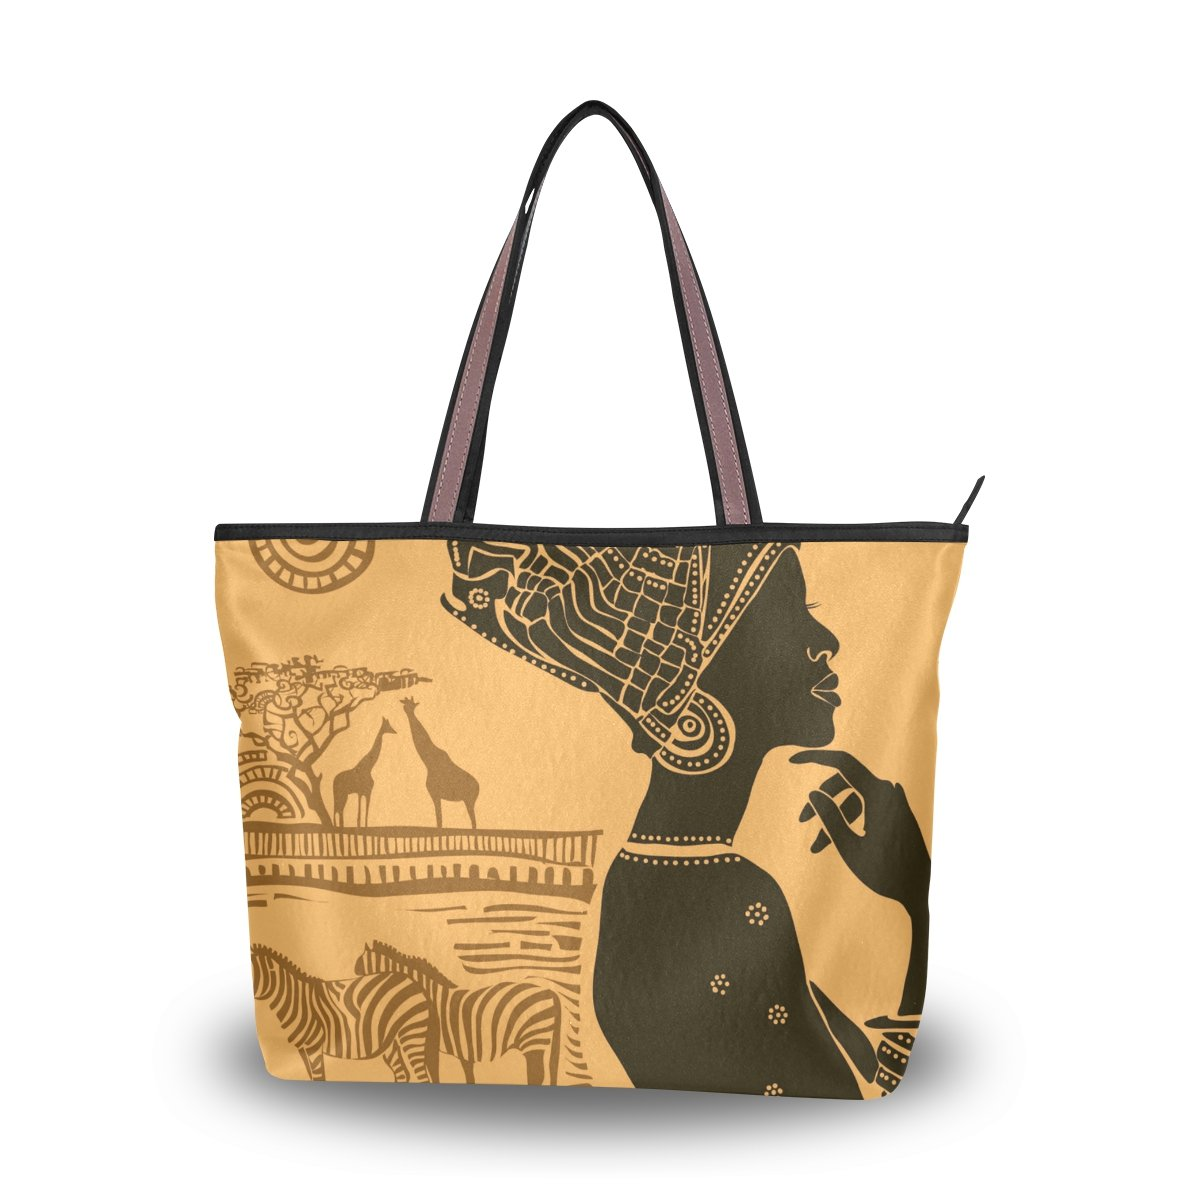 Rosy Pet Dog Cat Backpack Travel Carrier Front Bag Back Pack with Dual Shoulder Straps (Rosy)